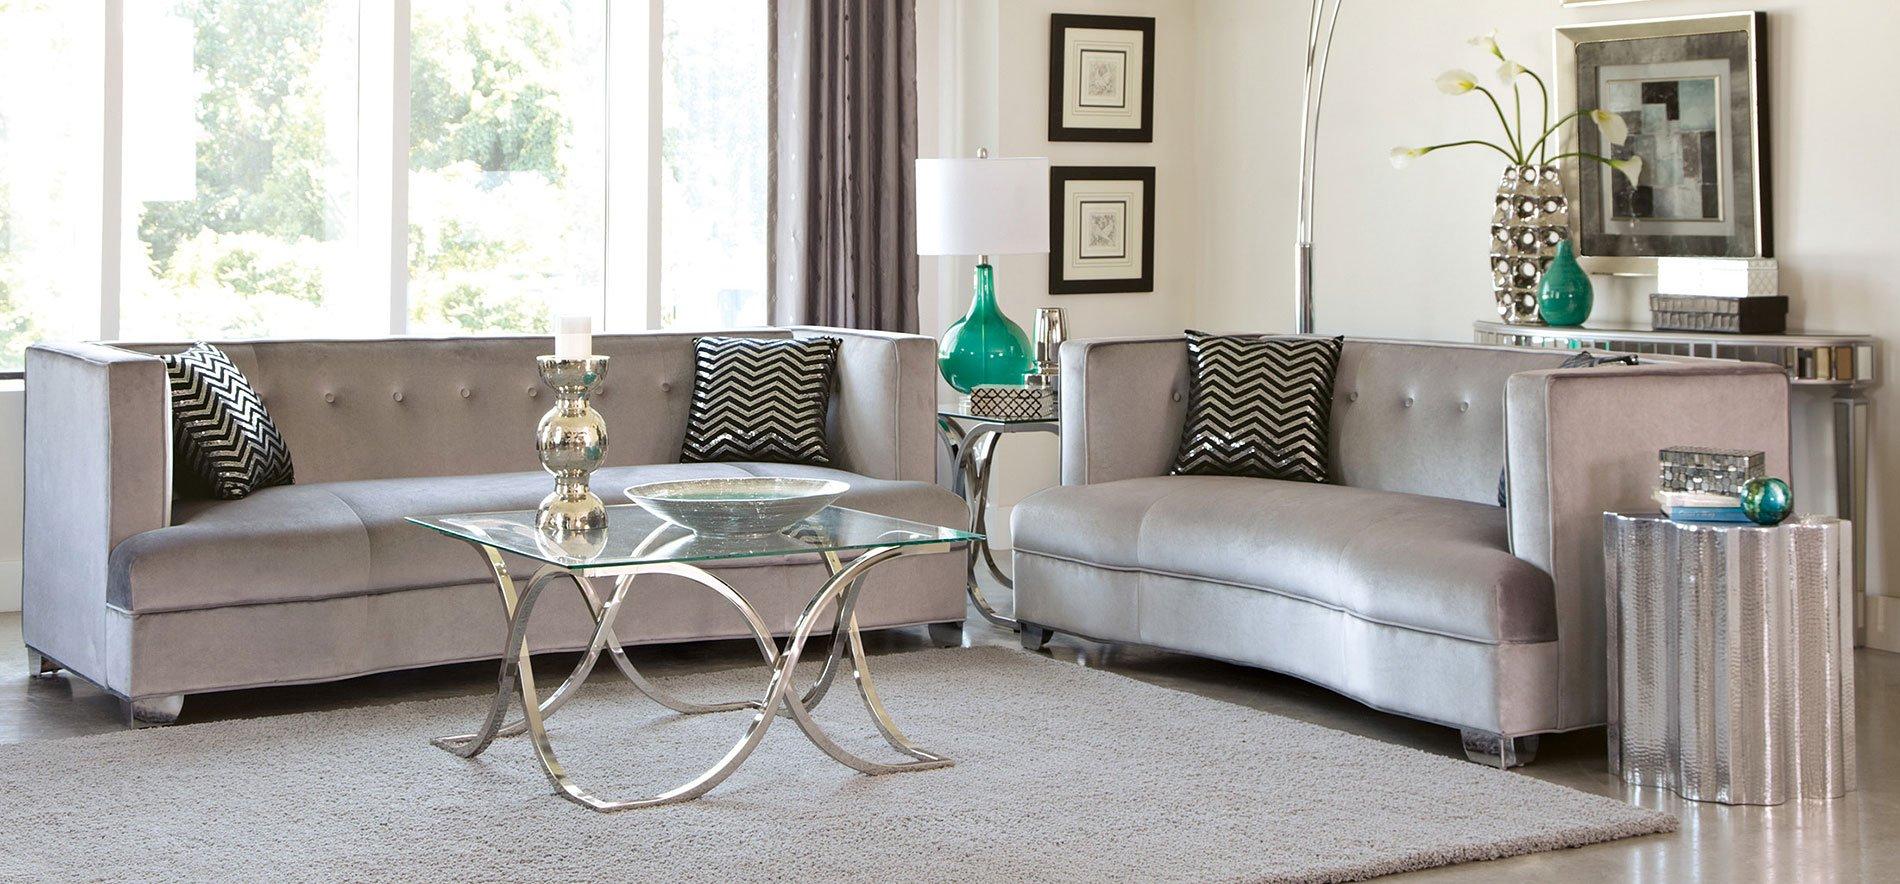 Caldwell Living Room Set